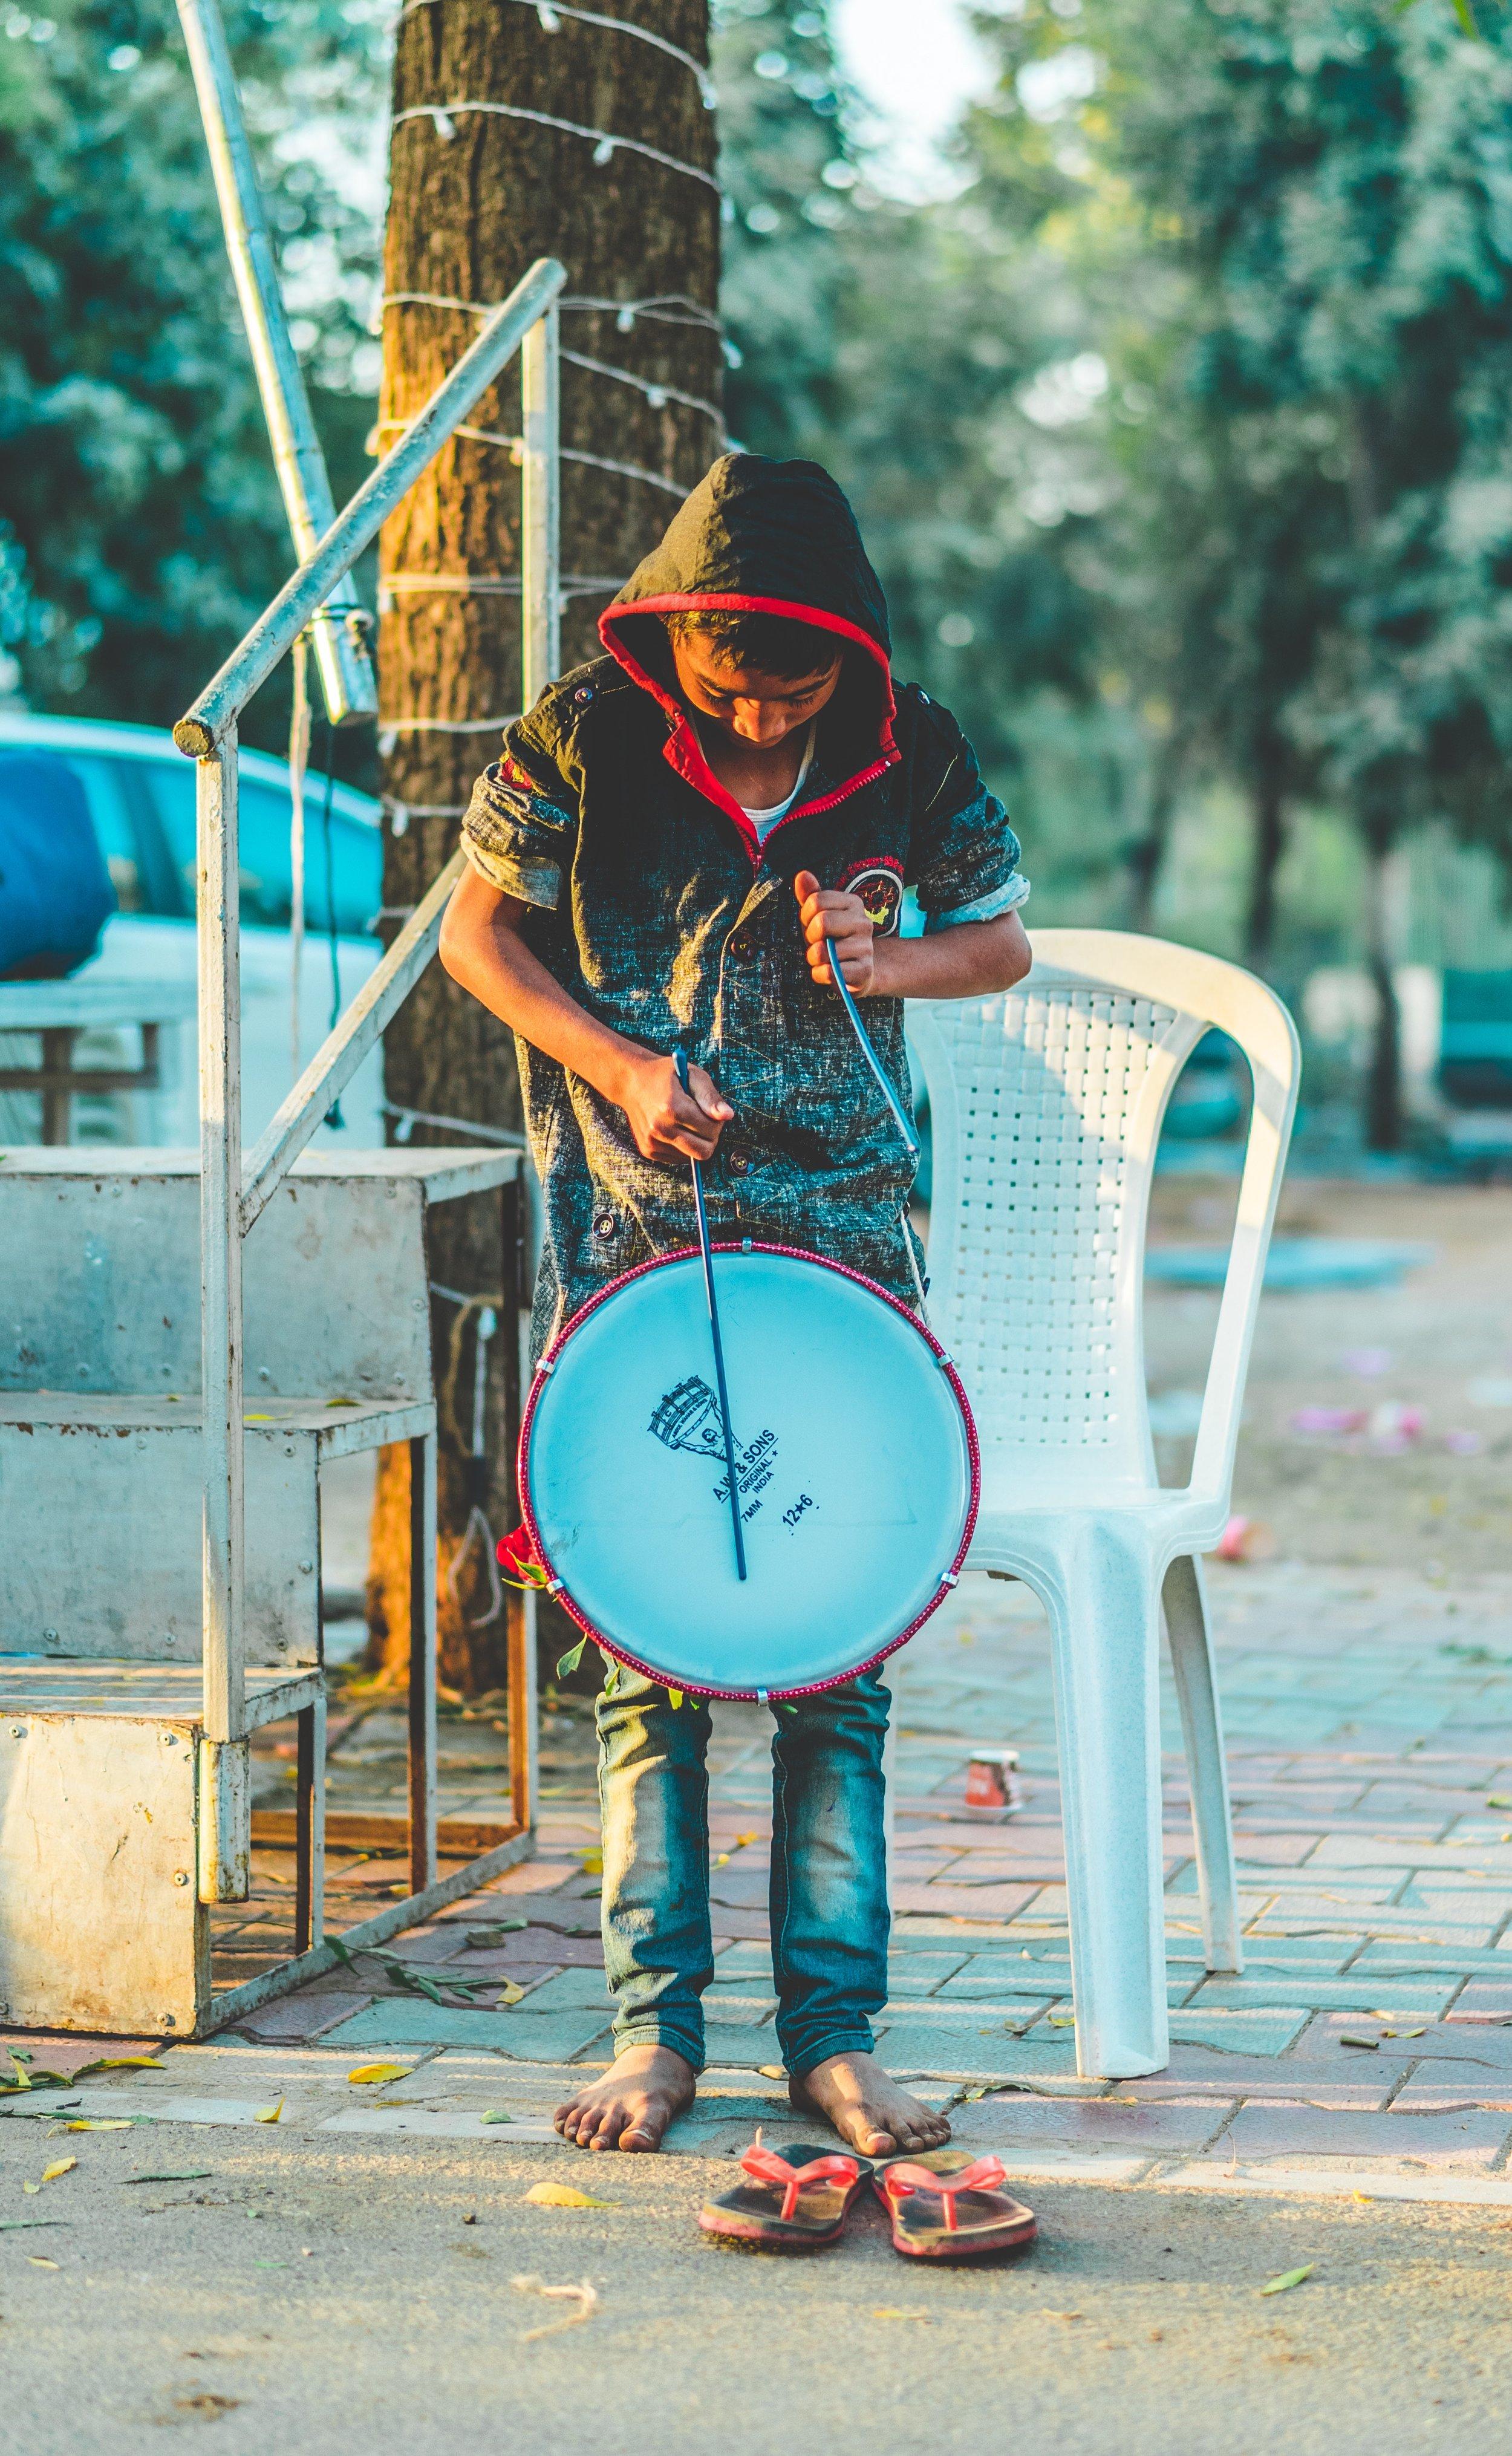 Want to find your rhythm?  Photo by  Ashwini Chaudhary  on  Unsplash